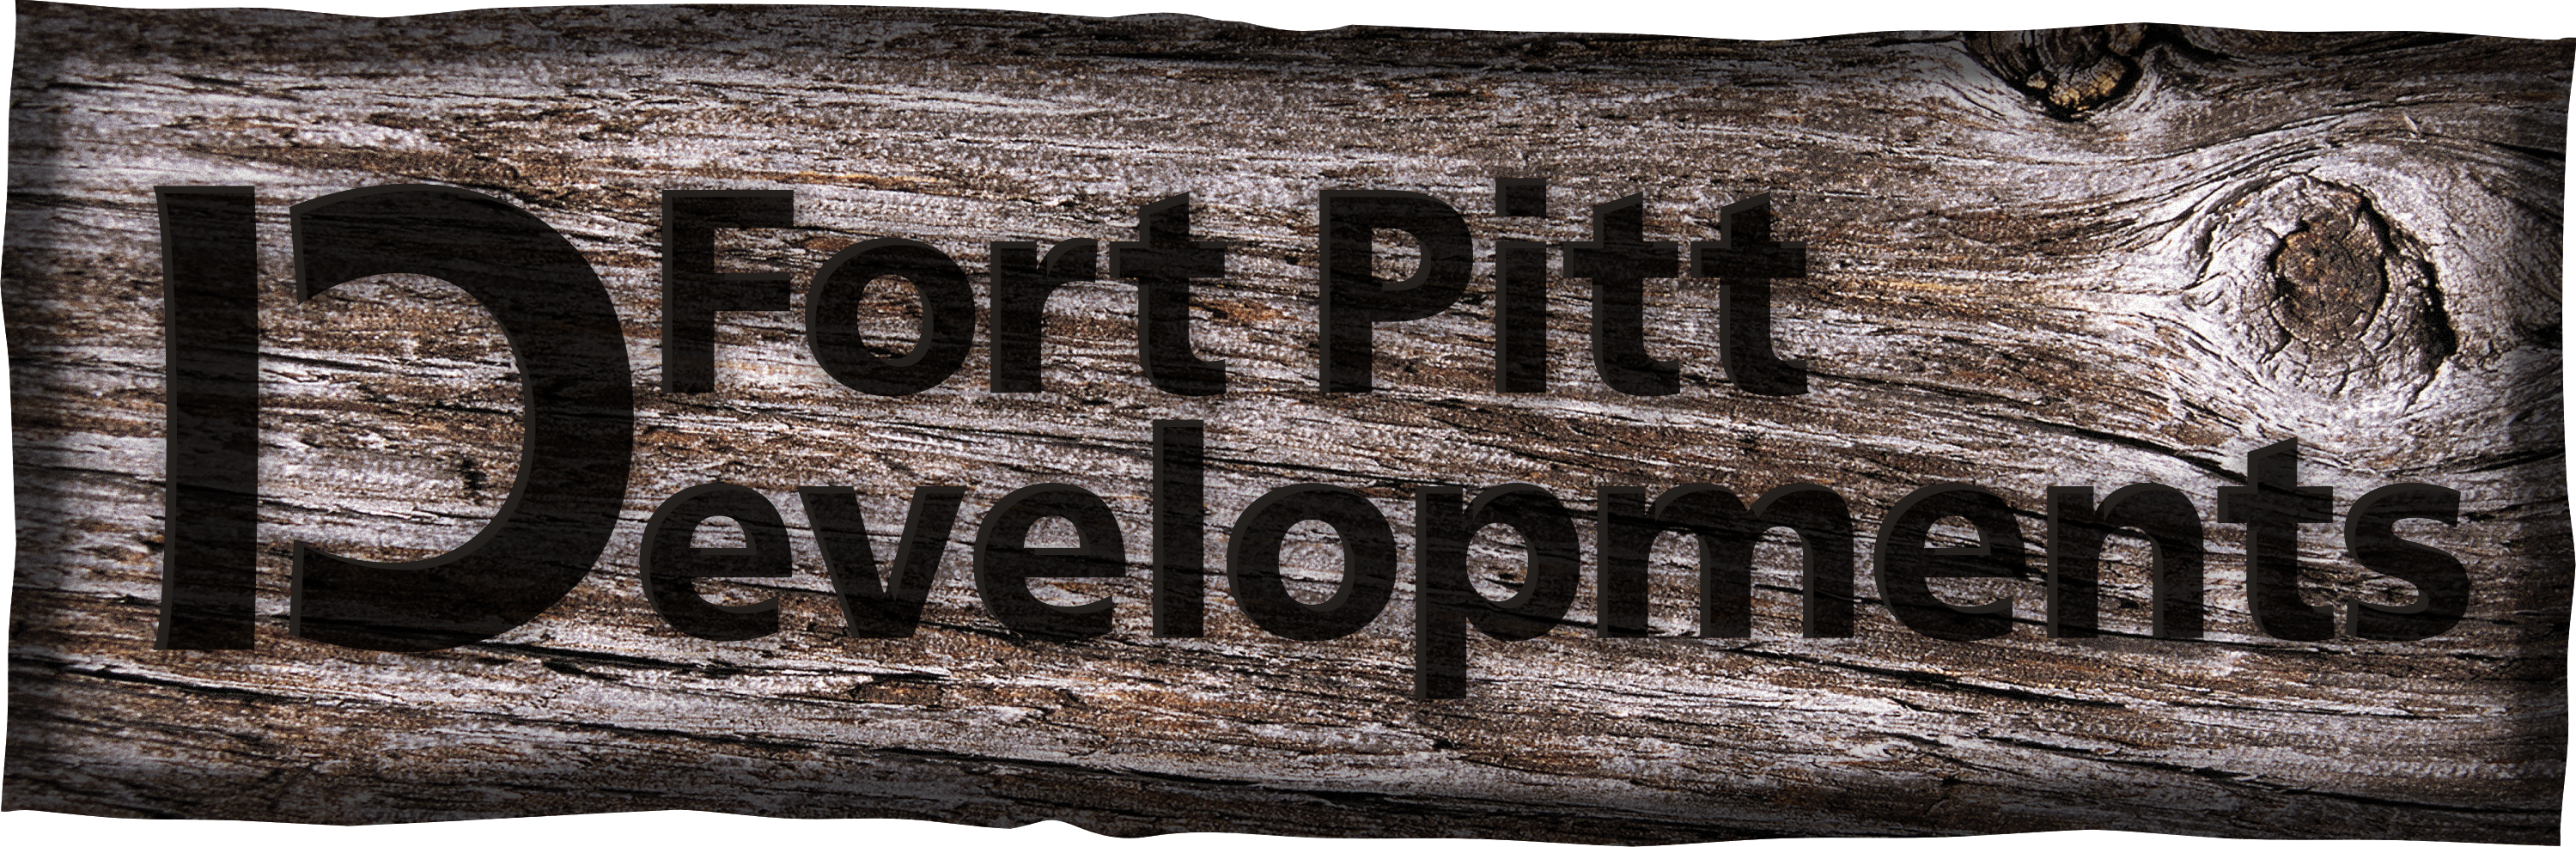 Fort Pitt Developments